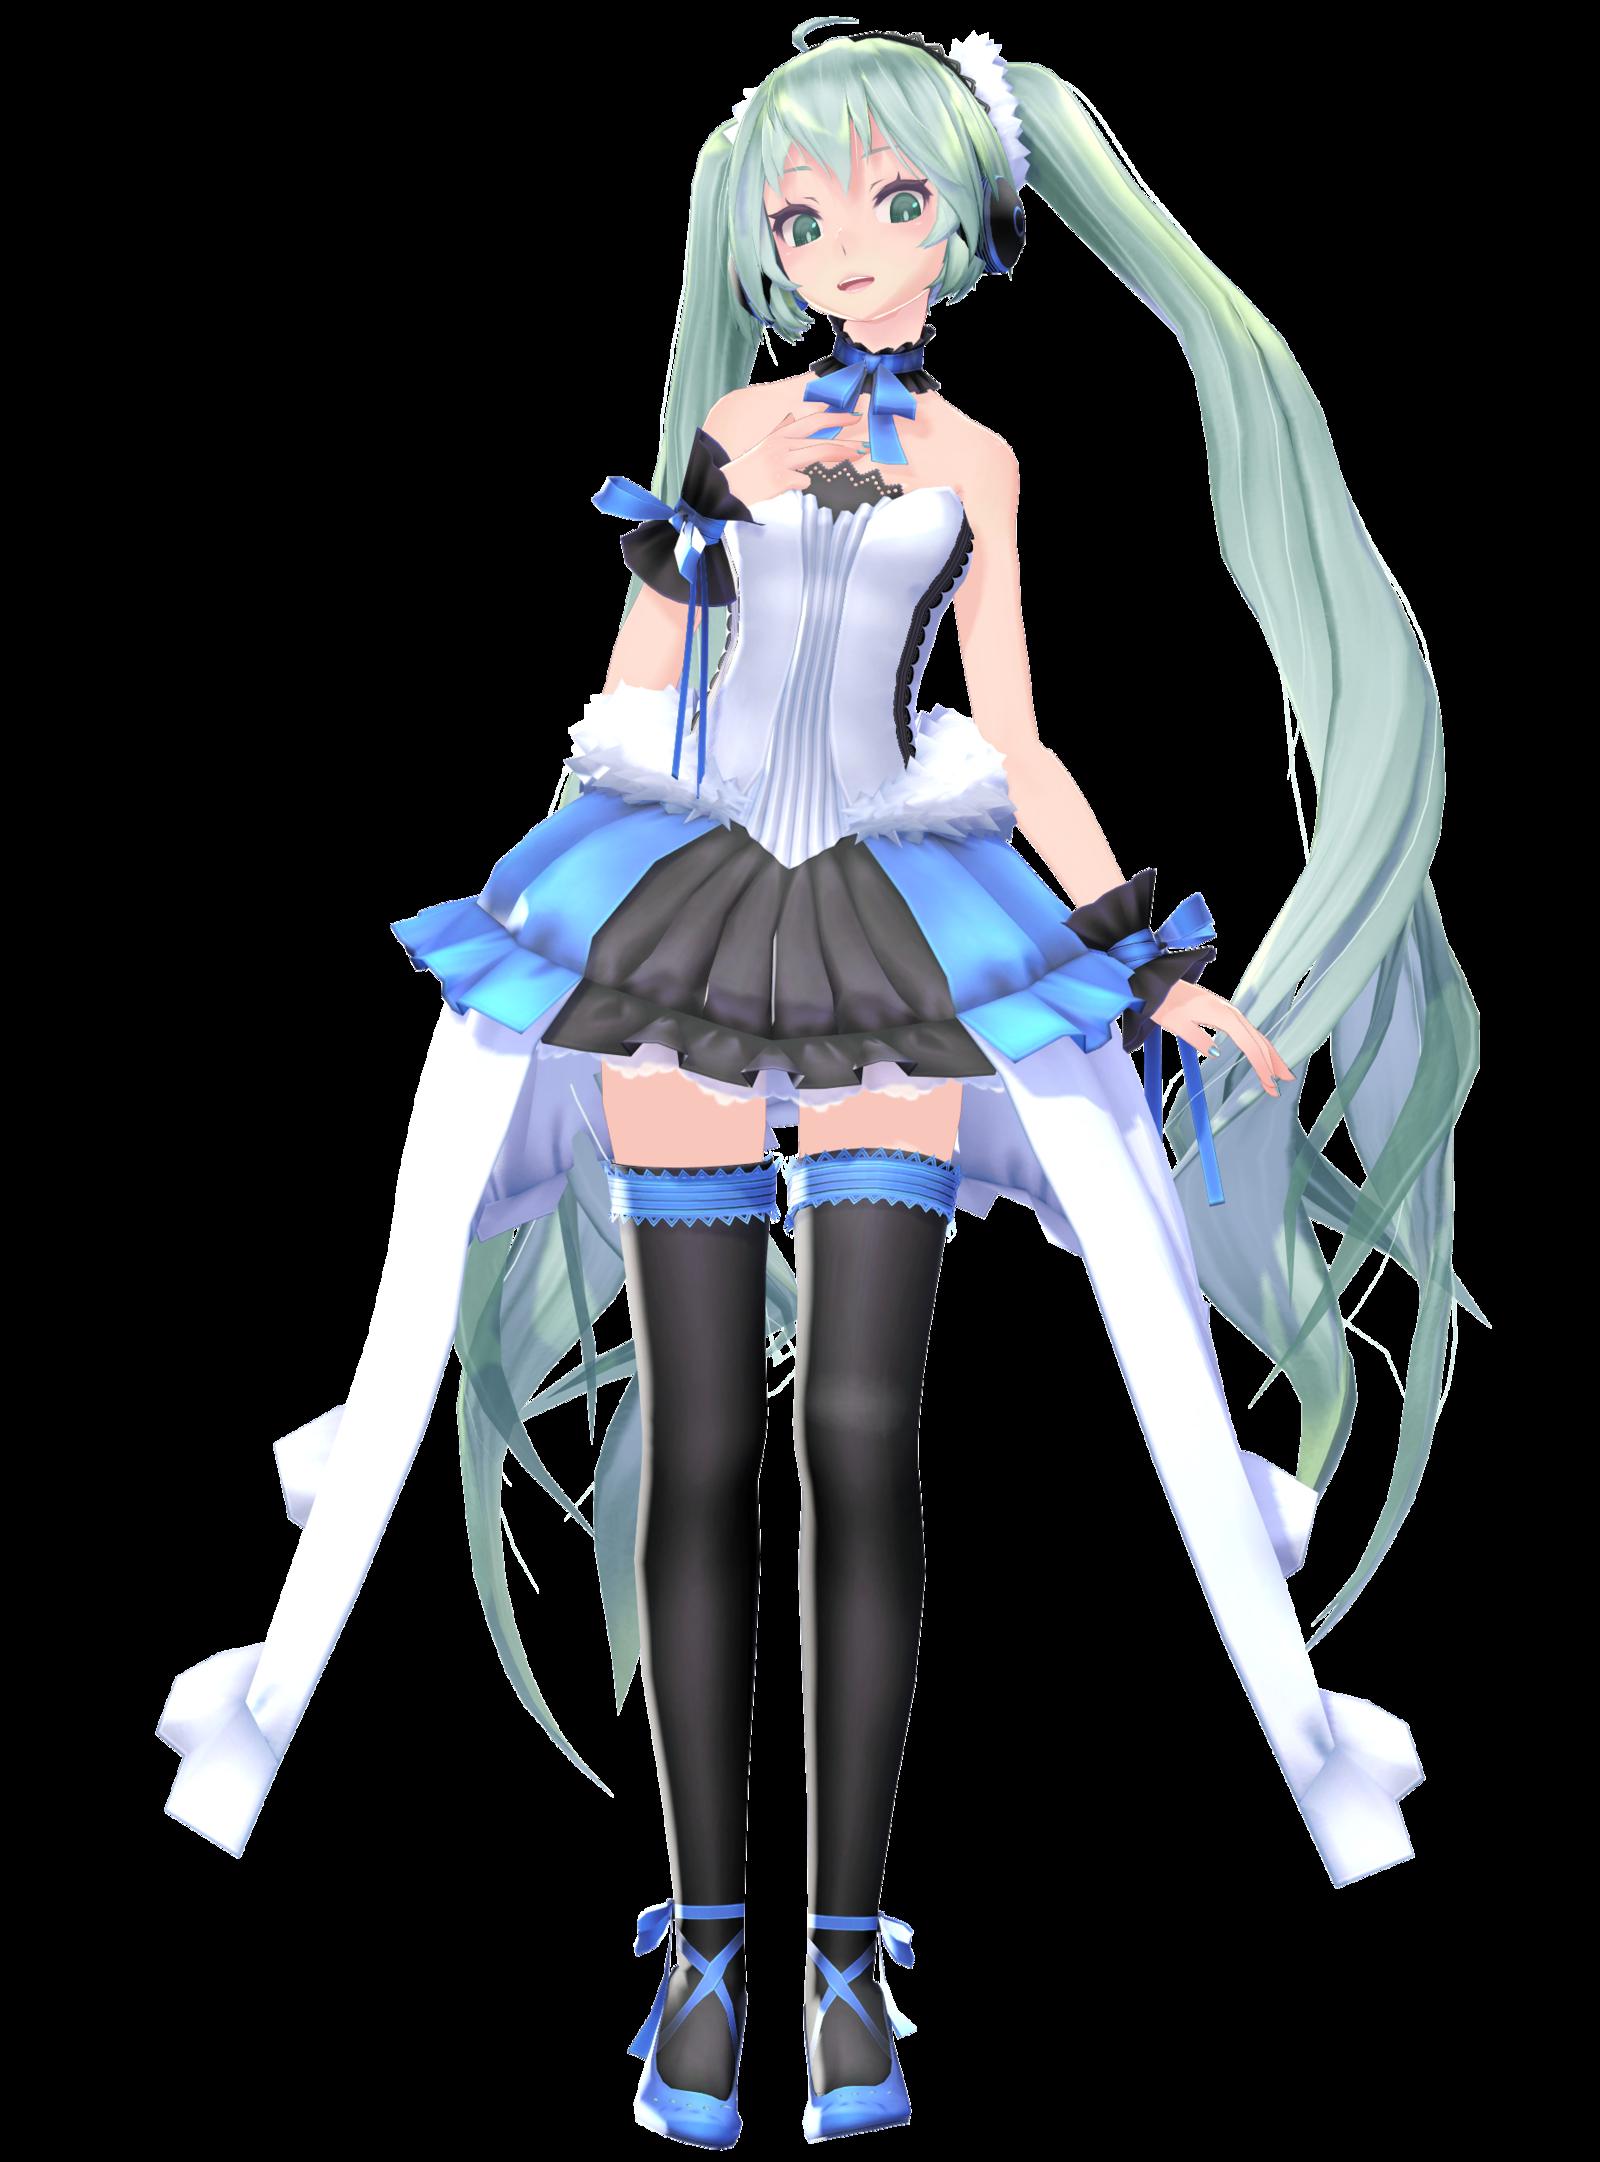 Mmd dress models download by hikariwakamiya on deviantart -  Dl Tda Type2020 Miku By Senseitag On Deviantart